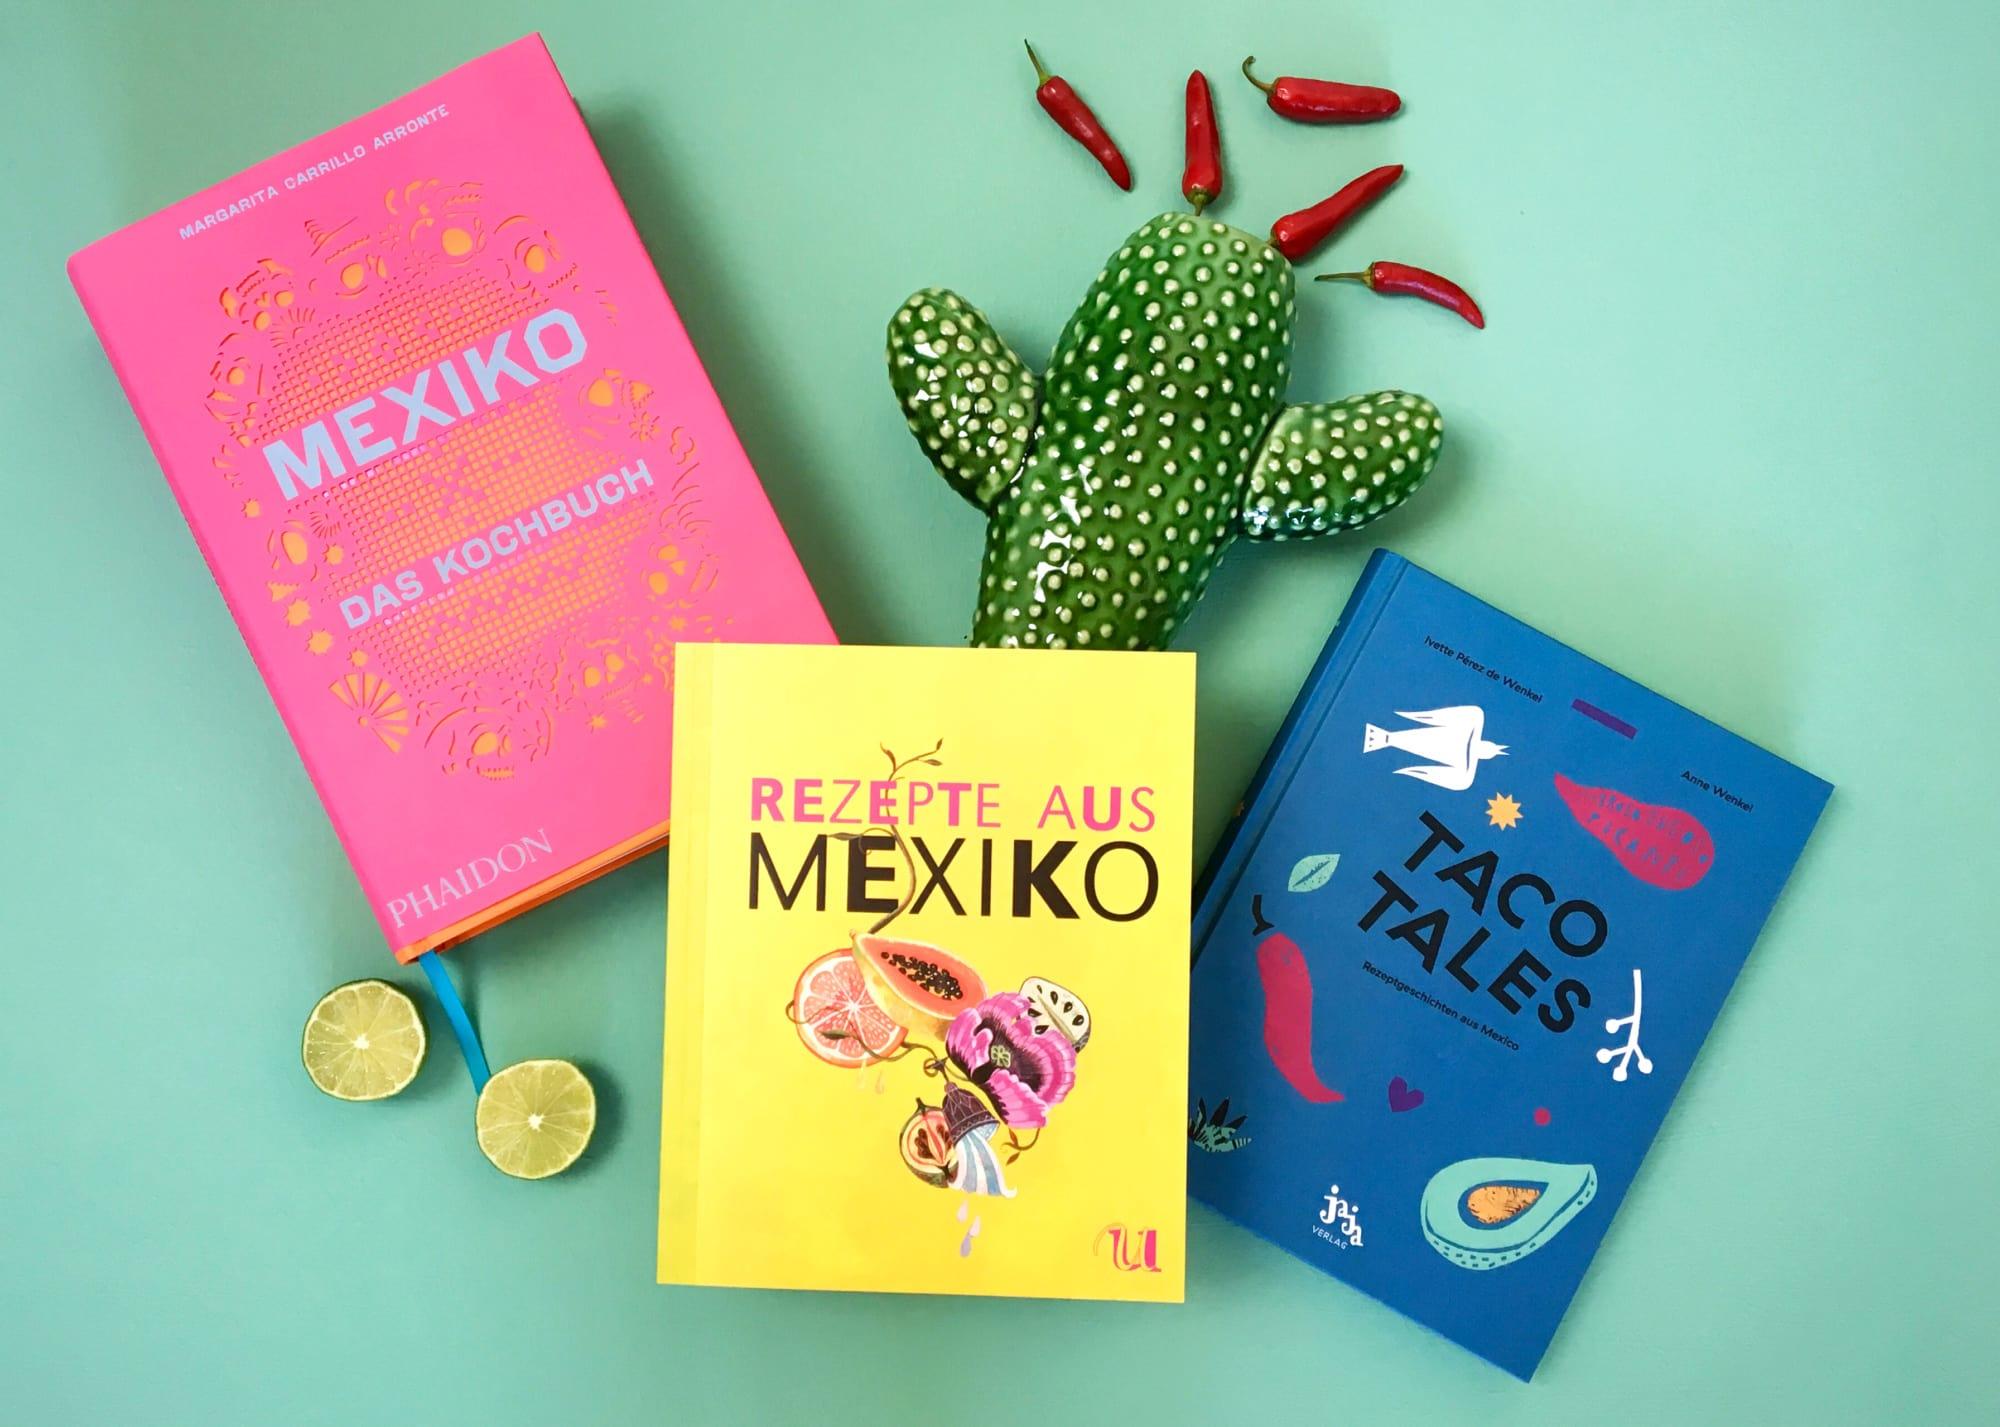 das mexiko kochbuch bilder geschichten rezepte illustrierte landerkuchen bilder geschichten rezepte